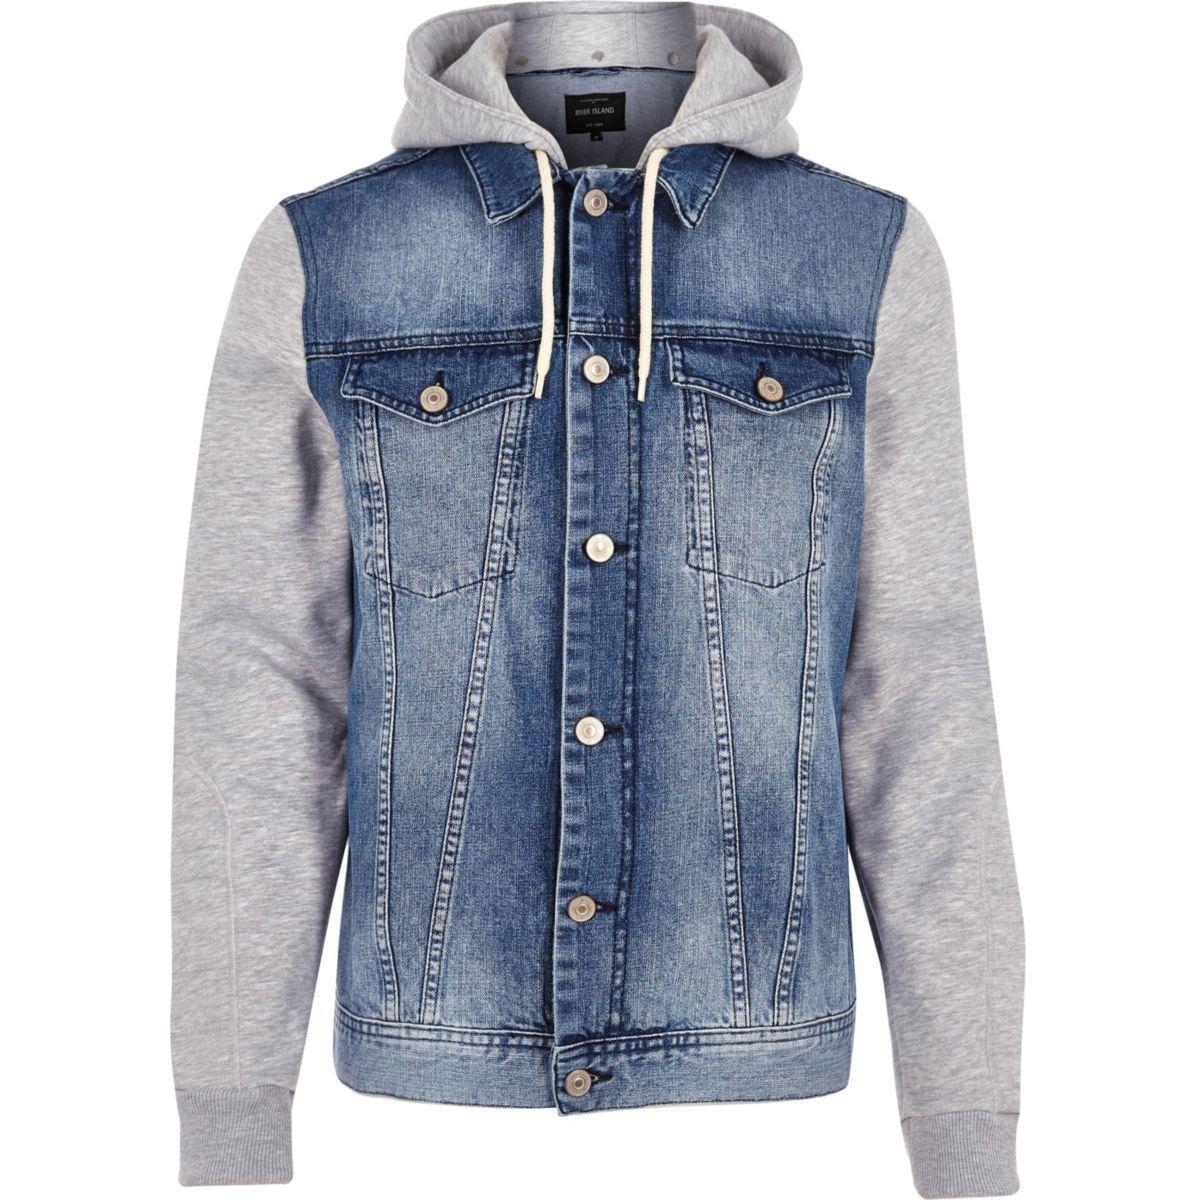 Blue Jersey Hoodie Denim Jacket Blue Jacket Men Stylish Jackets Mens Jackets [ 1200 x 1200 Pixel ]